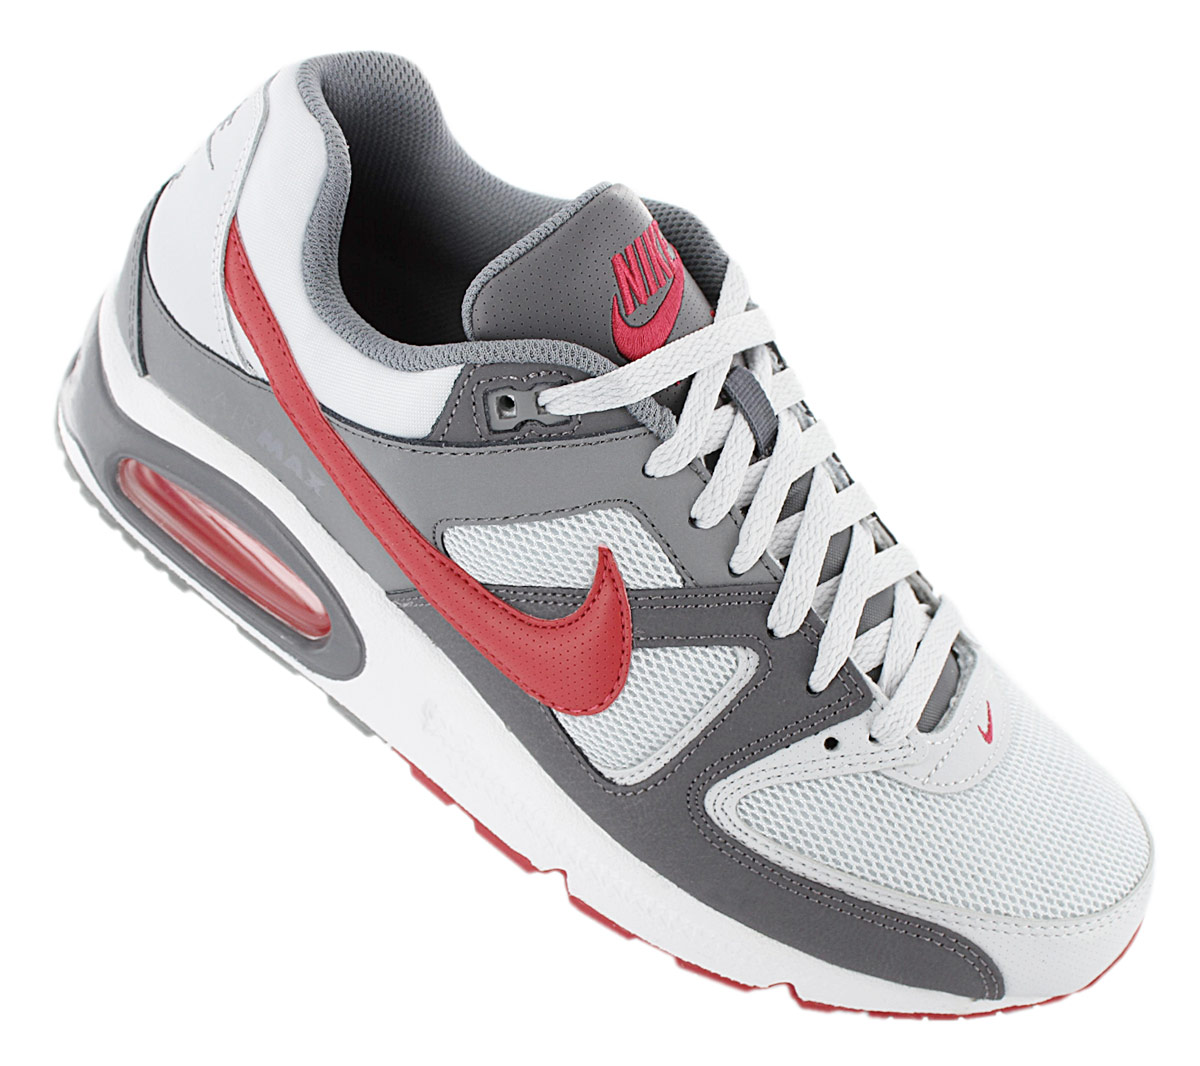 Details zu Nike Air Max Command Herren Sneaker 629993 049 Grau Schuhe Turnschuhe Sportschuh